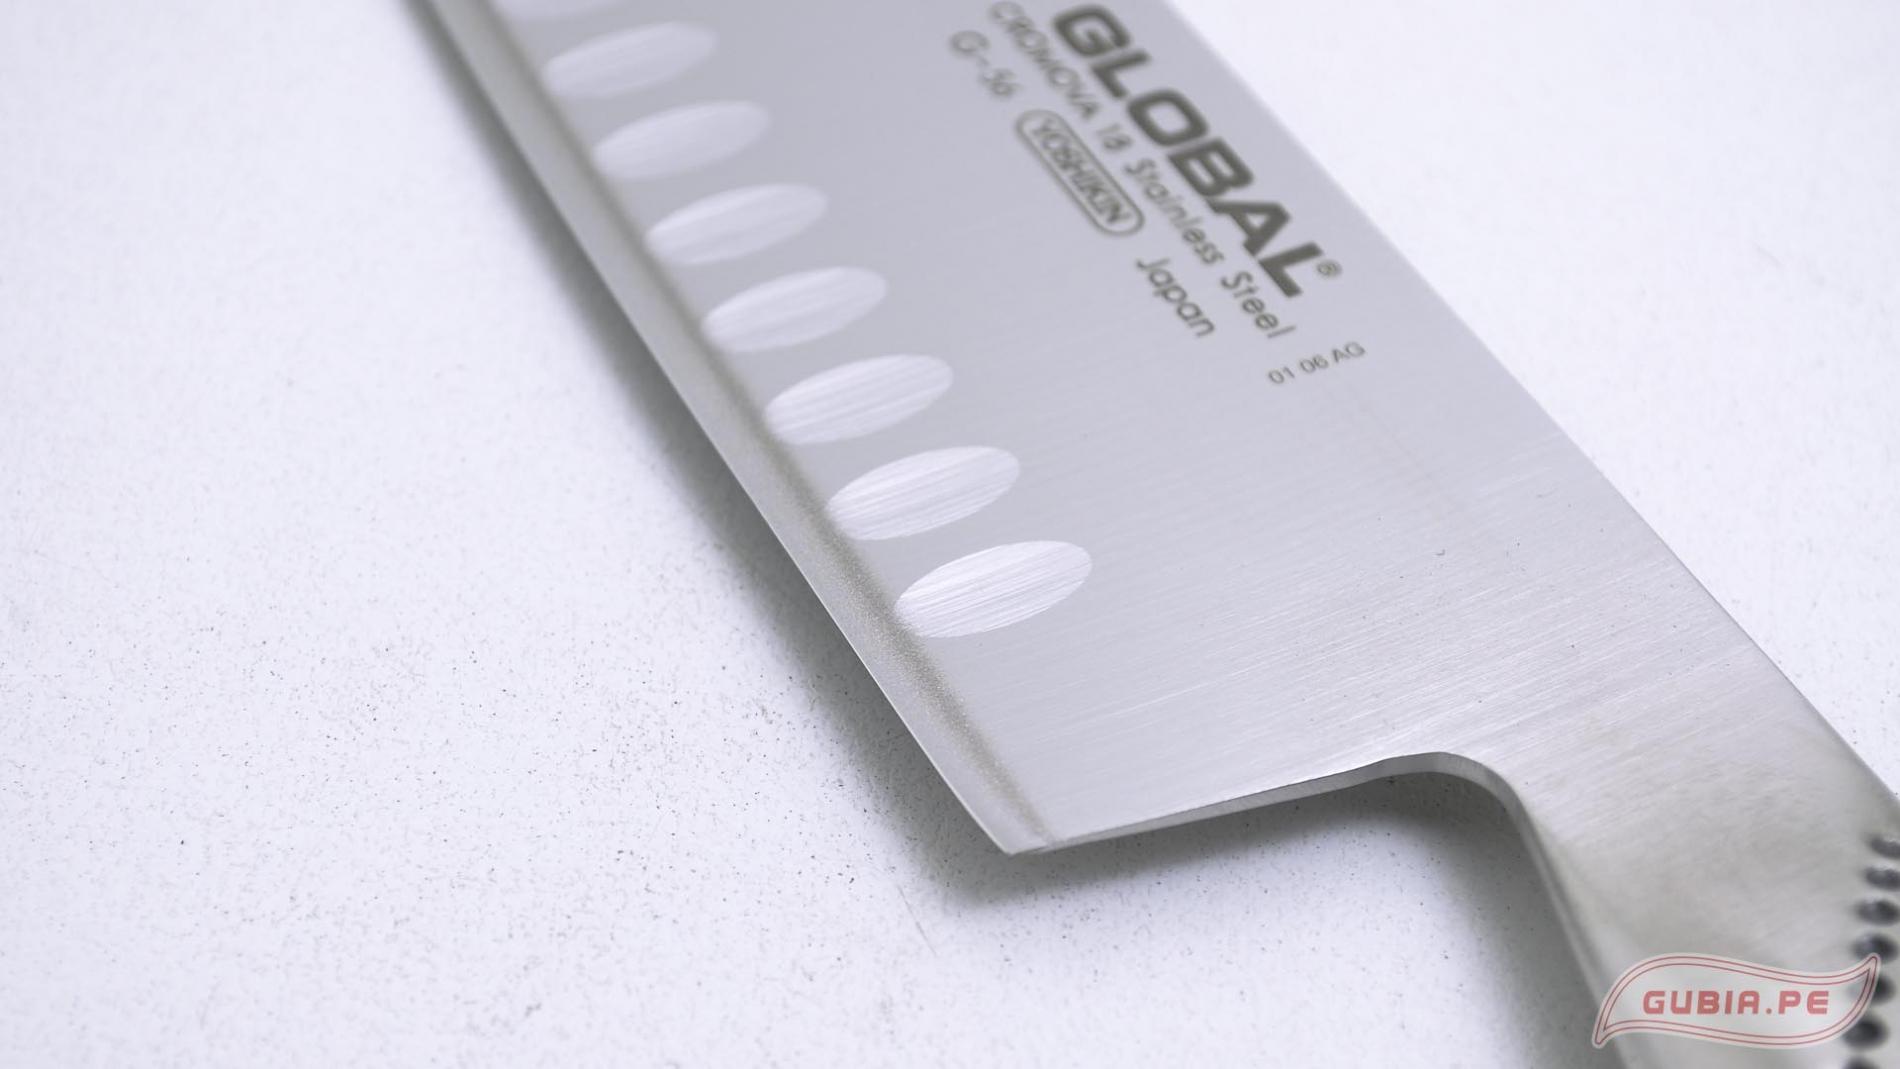 G-56-Cuchillo para vegetales corrugado 18cm Global G-56 -max-3.